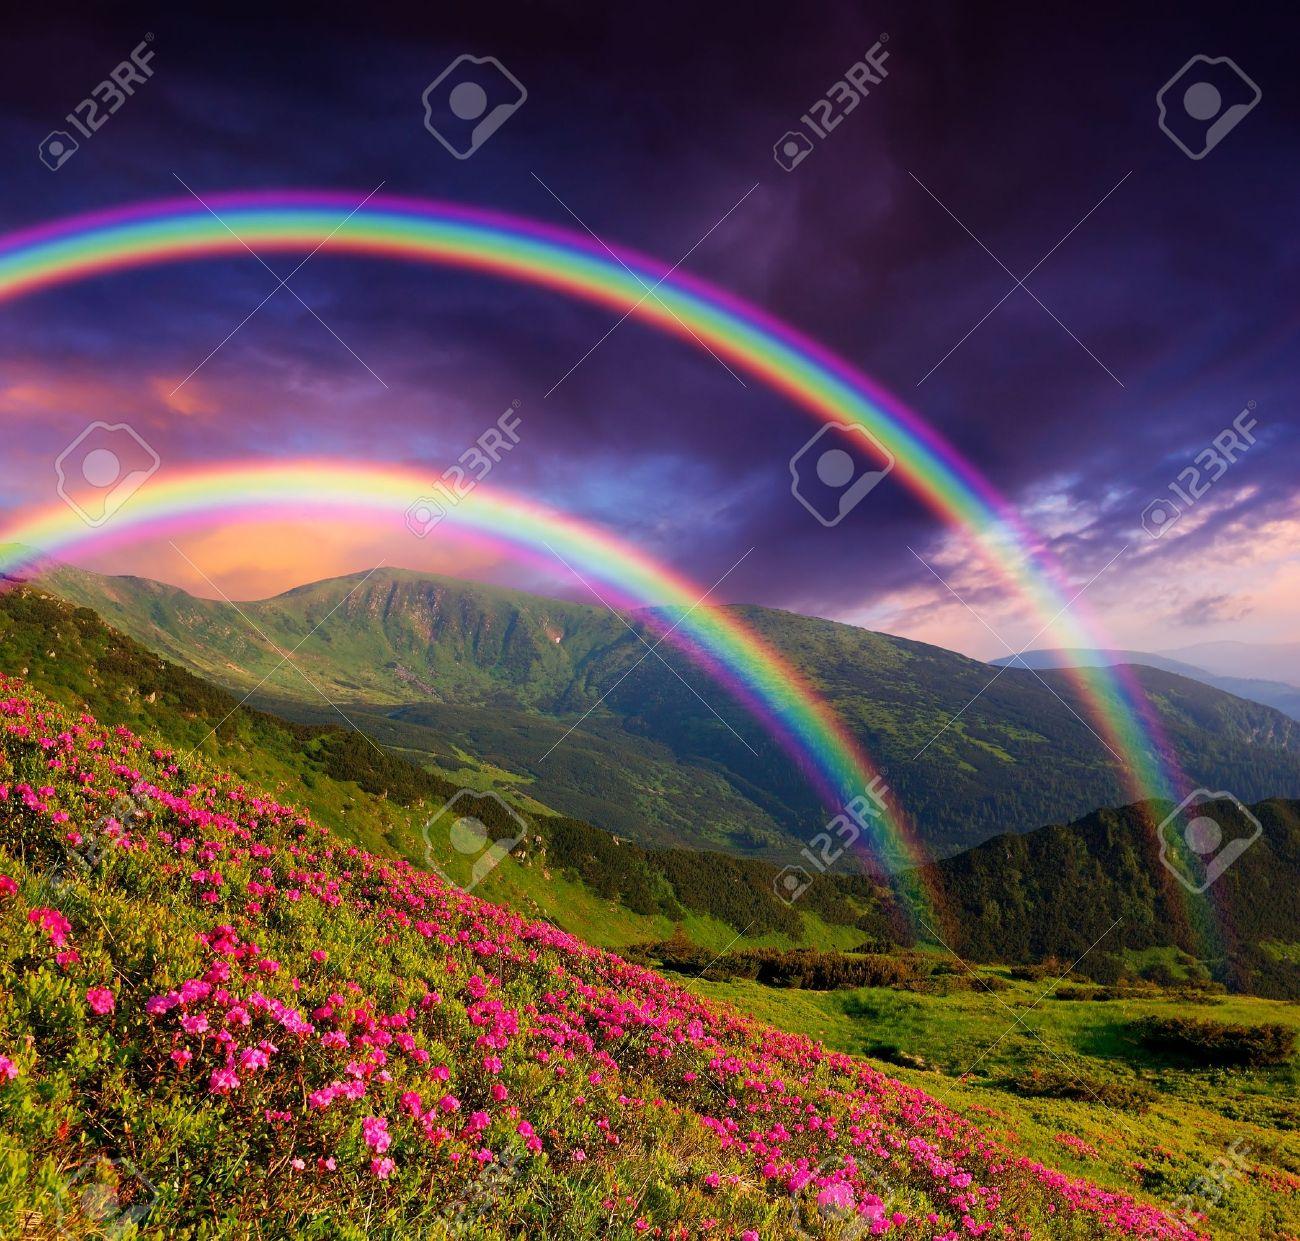 """ Il logo della settimana "" 2nd sessione - Pagina 21 18670913-Mountain-landscape-with-a-rainbow-over-flowers-Stock-Photo-rainbow"